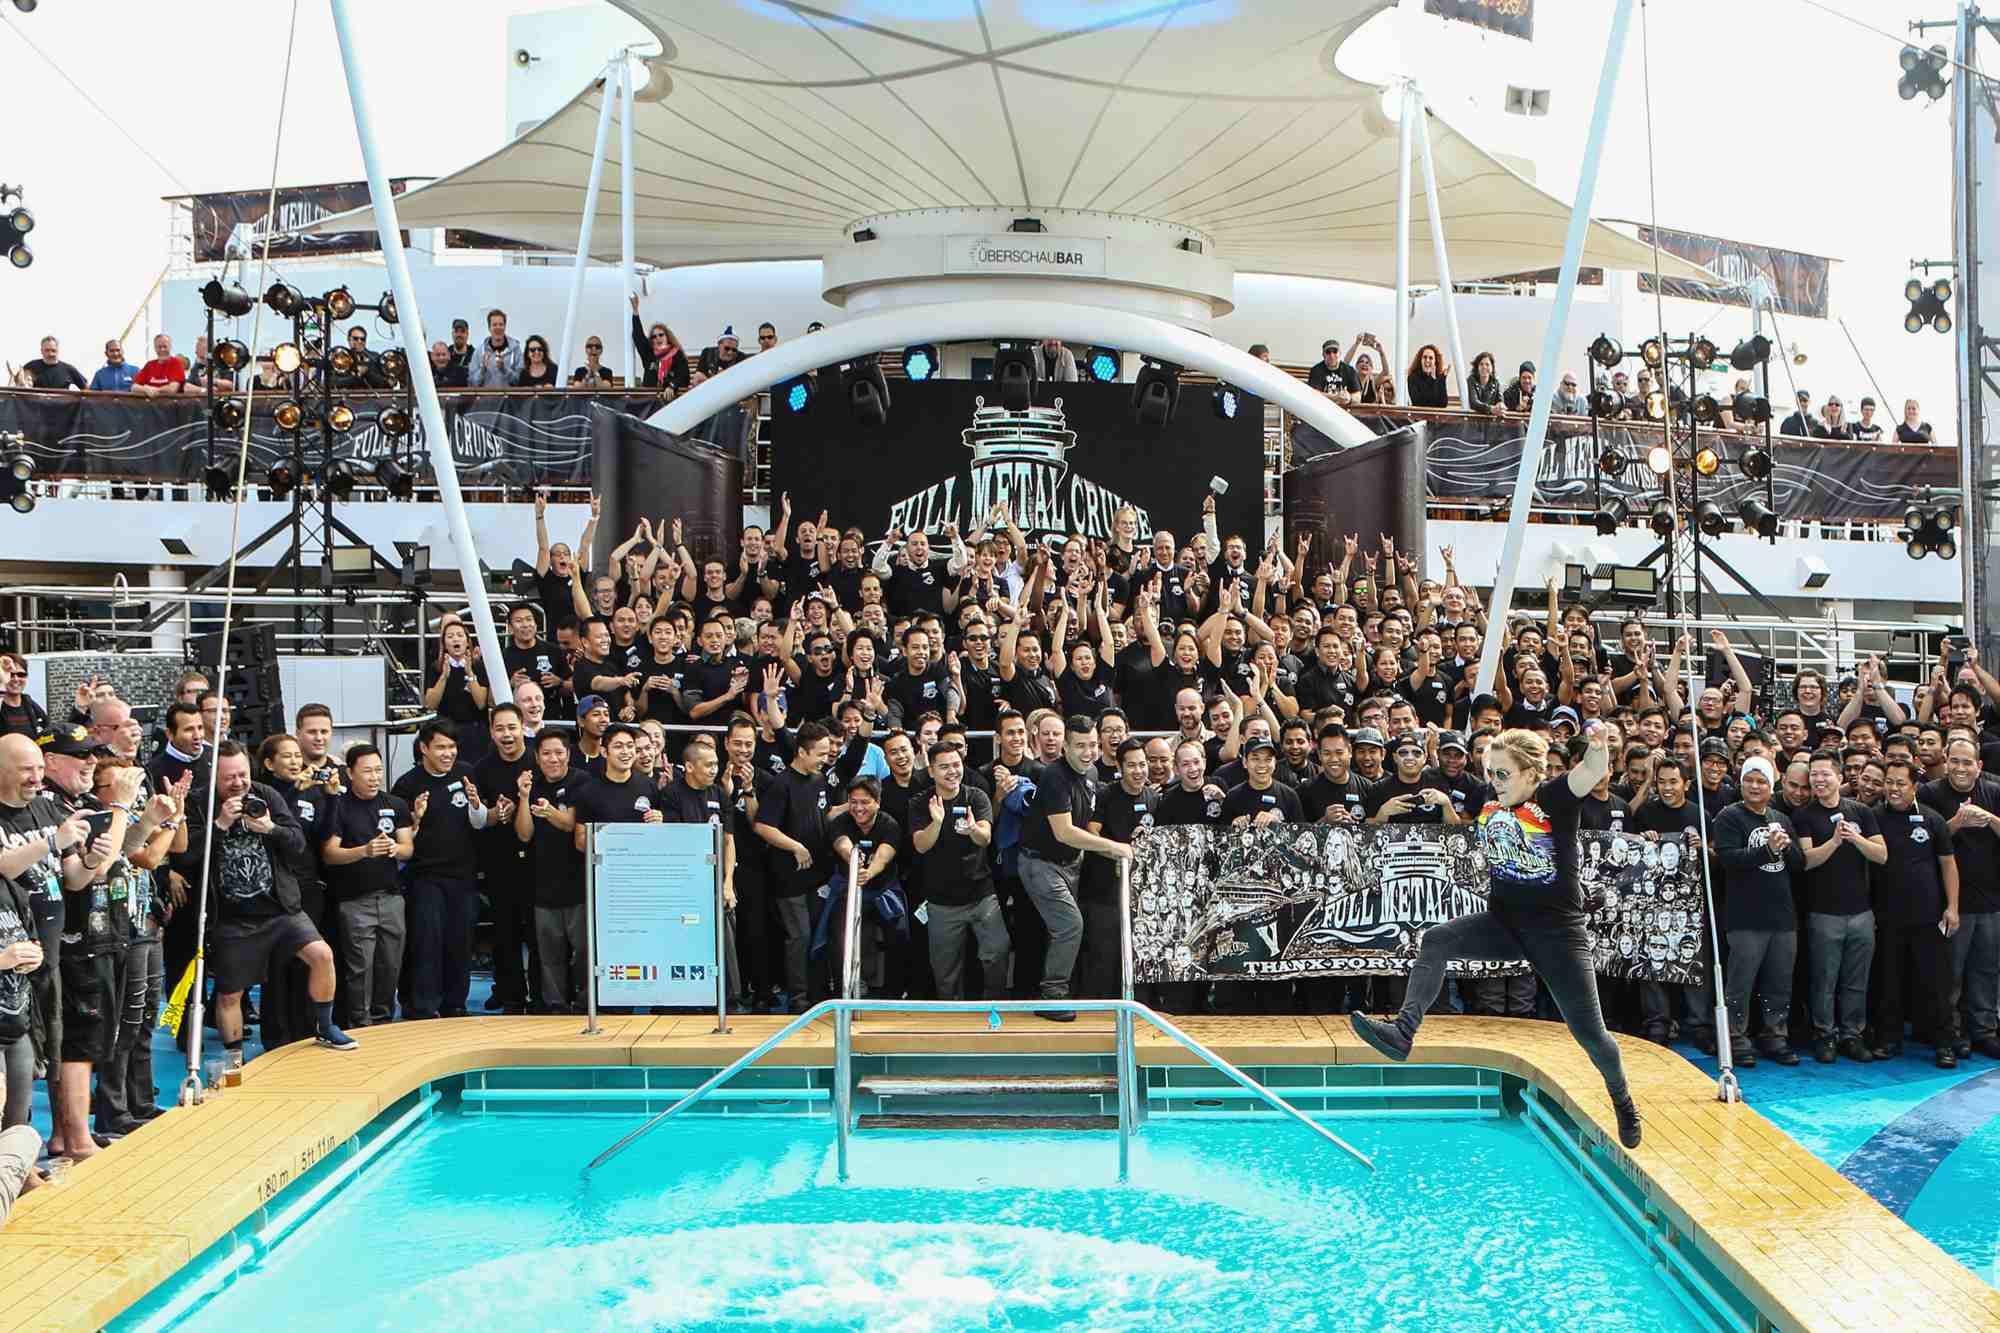 Full Metal Cruise Kreuzfahrt Mein Schiff 3